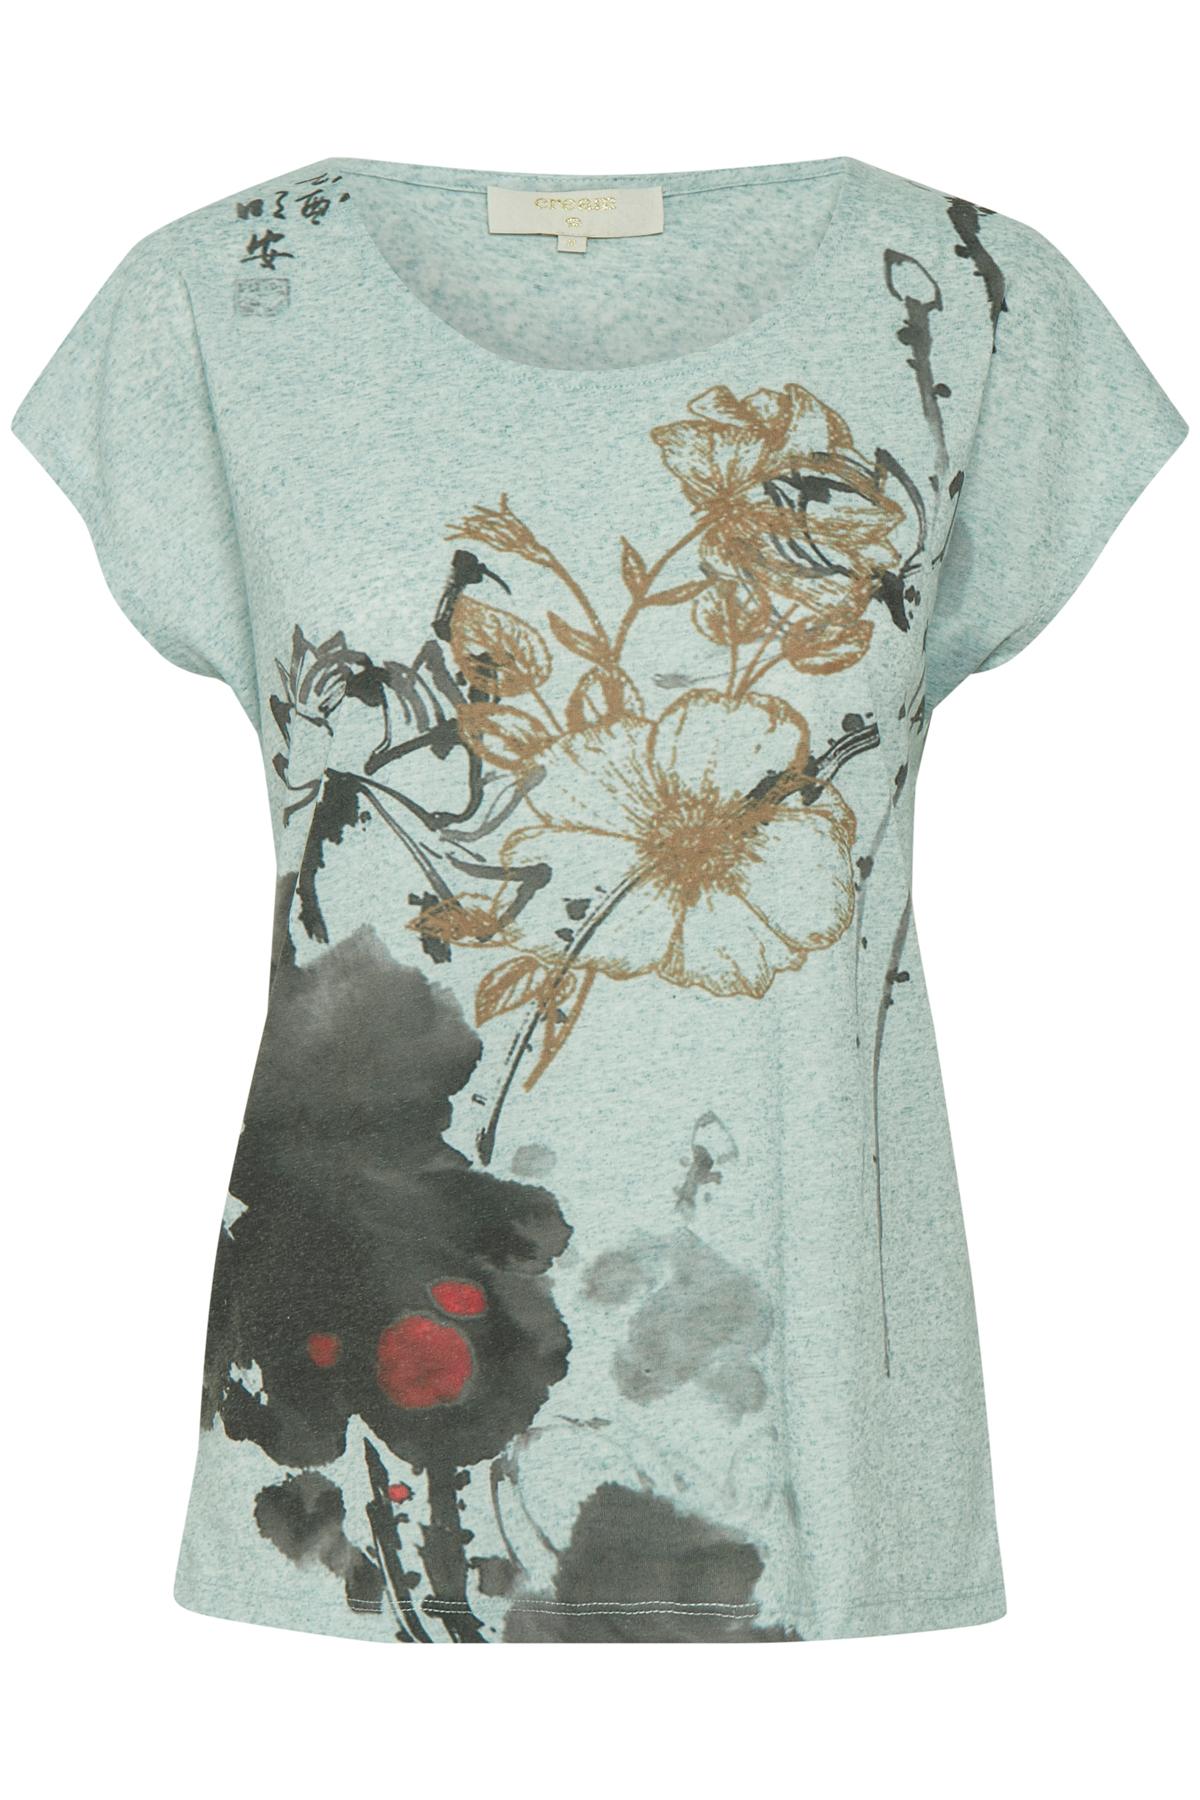 Image of Cream Dame Kortærmet Ally T-shirt - Lys turkis